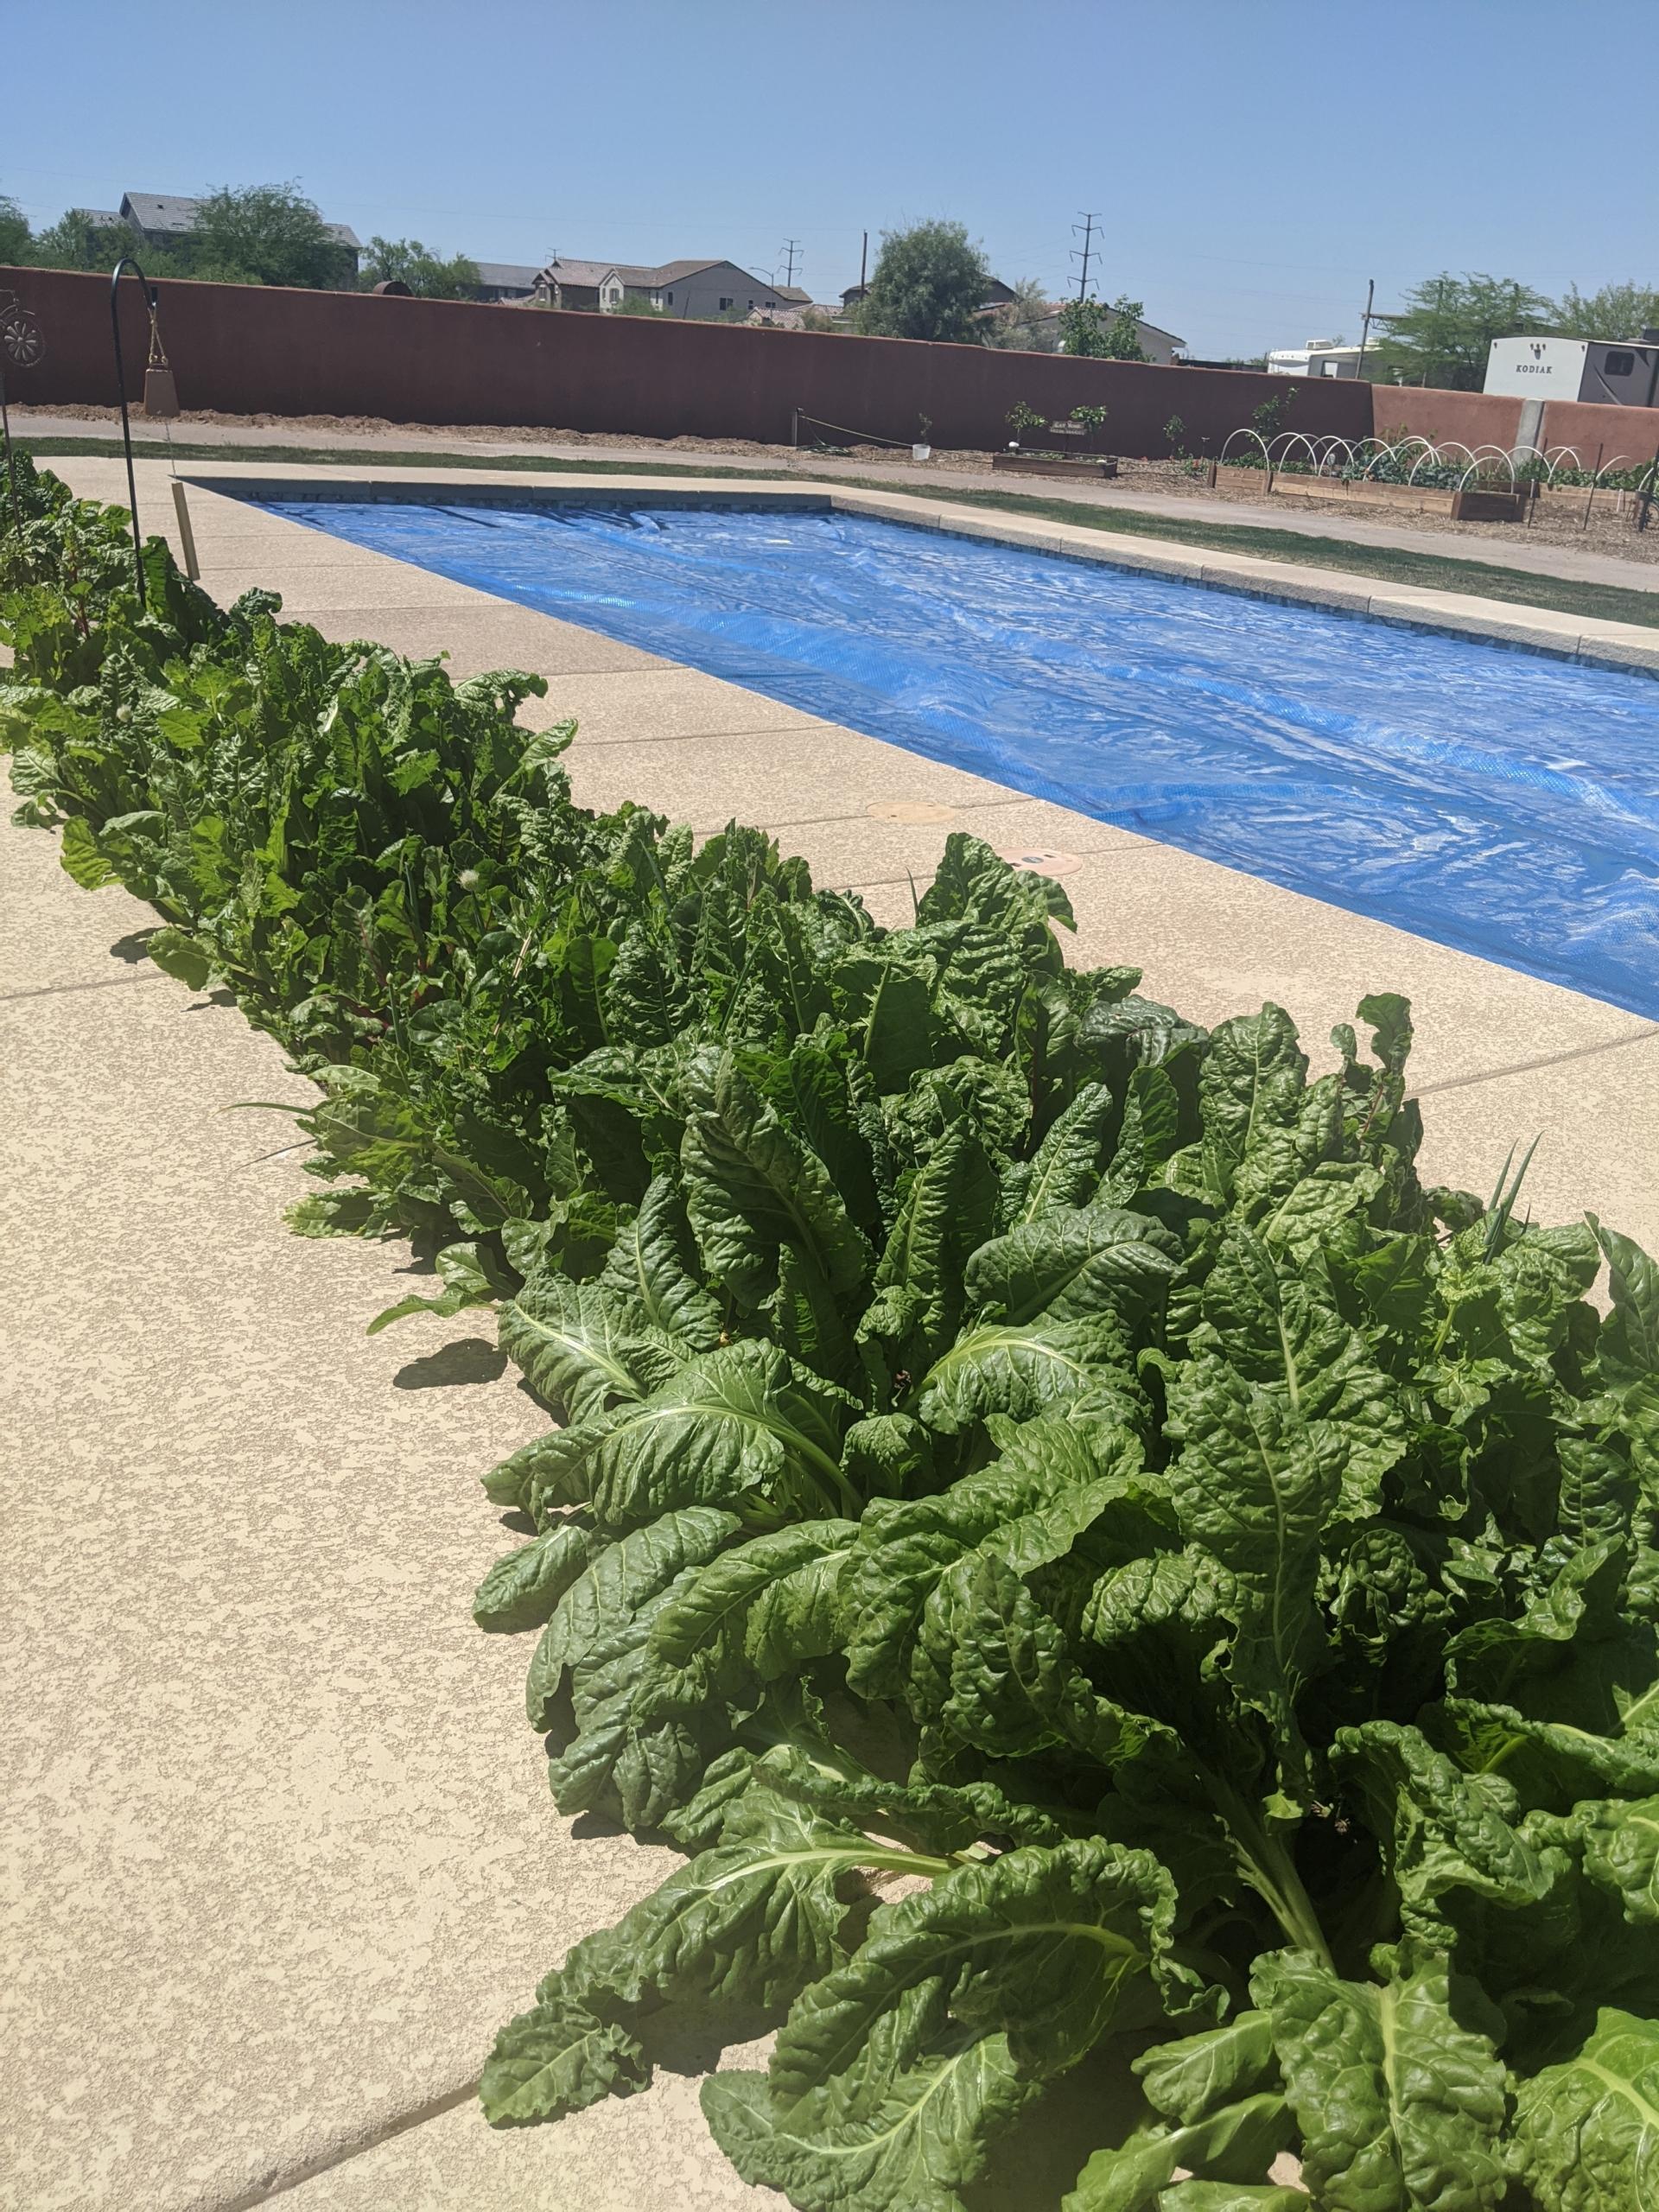 Landscaping Using Edible Plants | TigerMountain Foundation